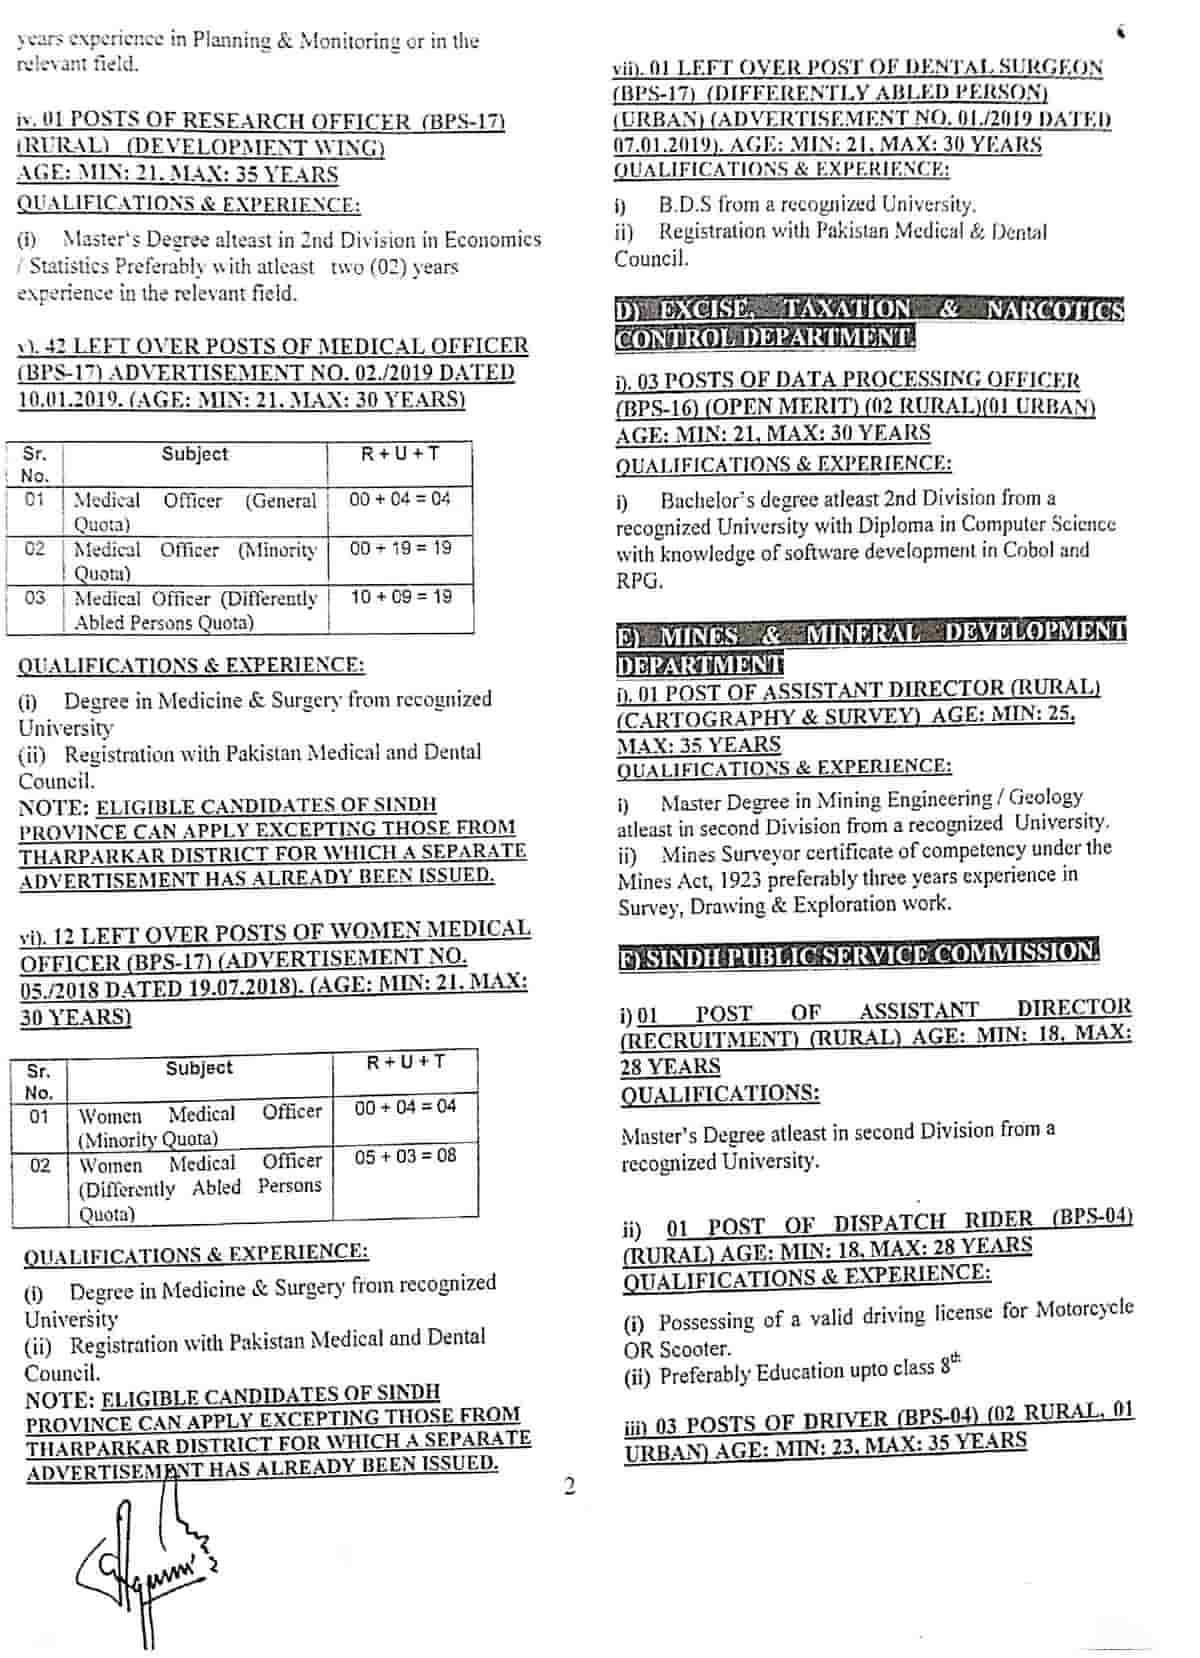 SPSC Jobs Advertisement No 1 2020 Apply Online Latest b